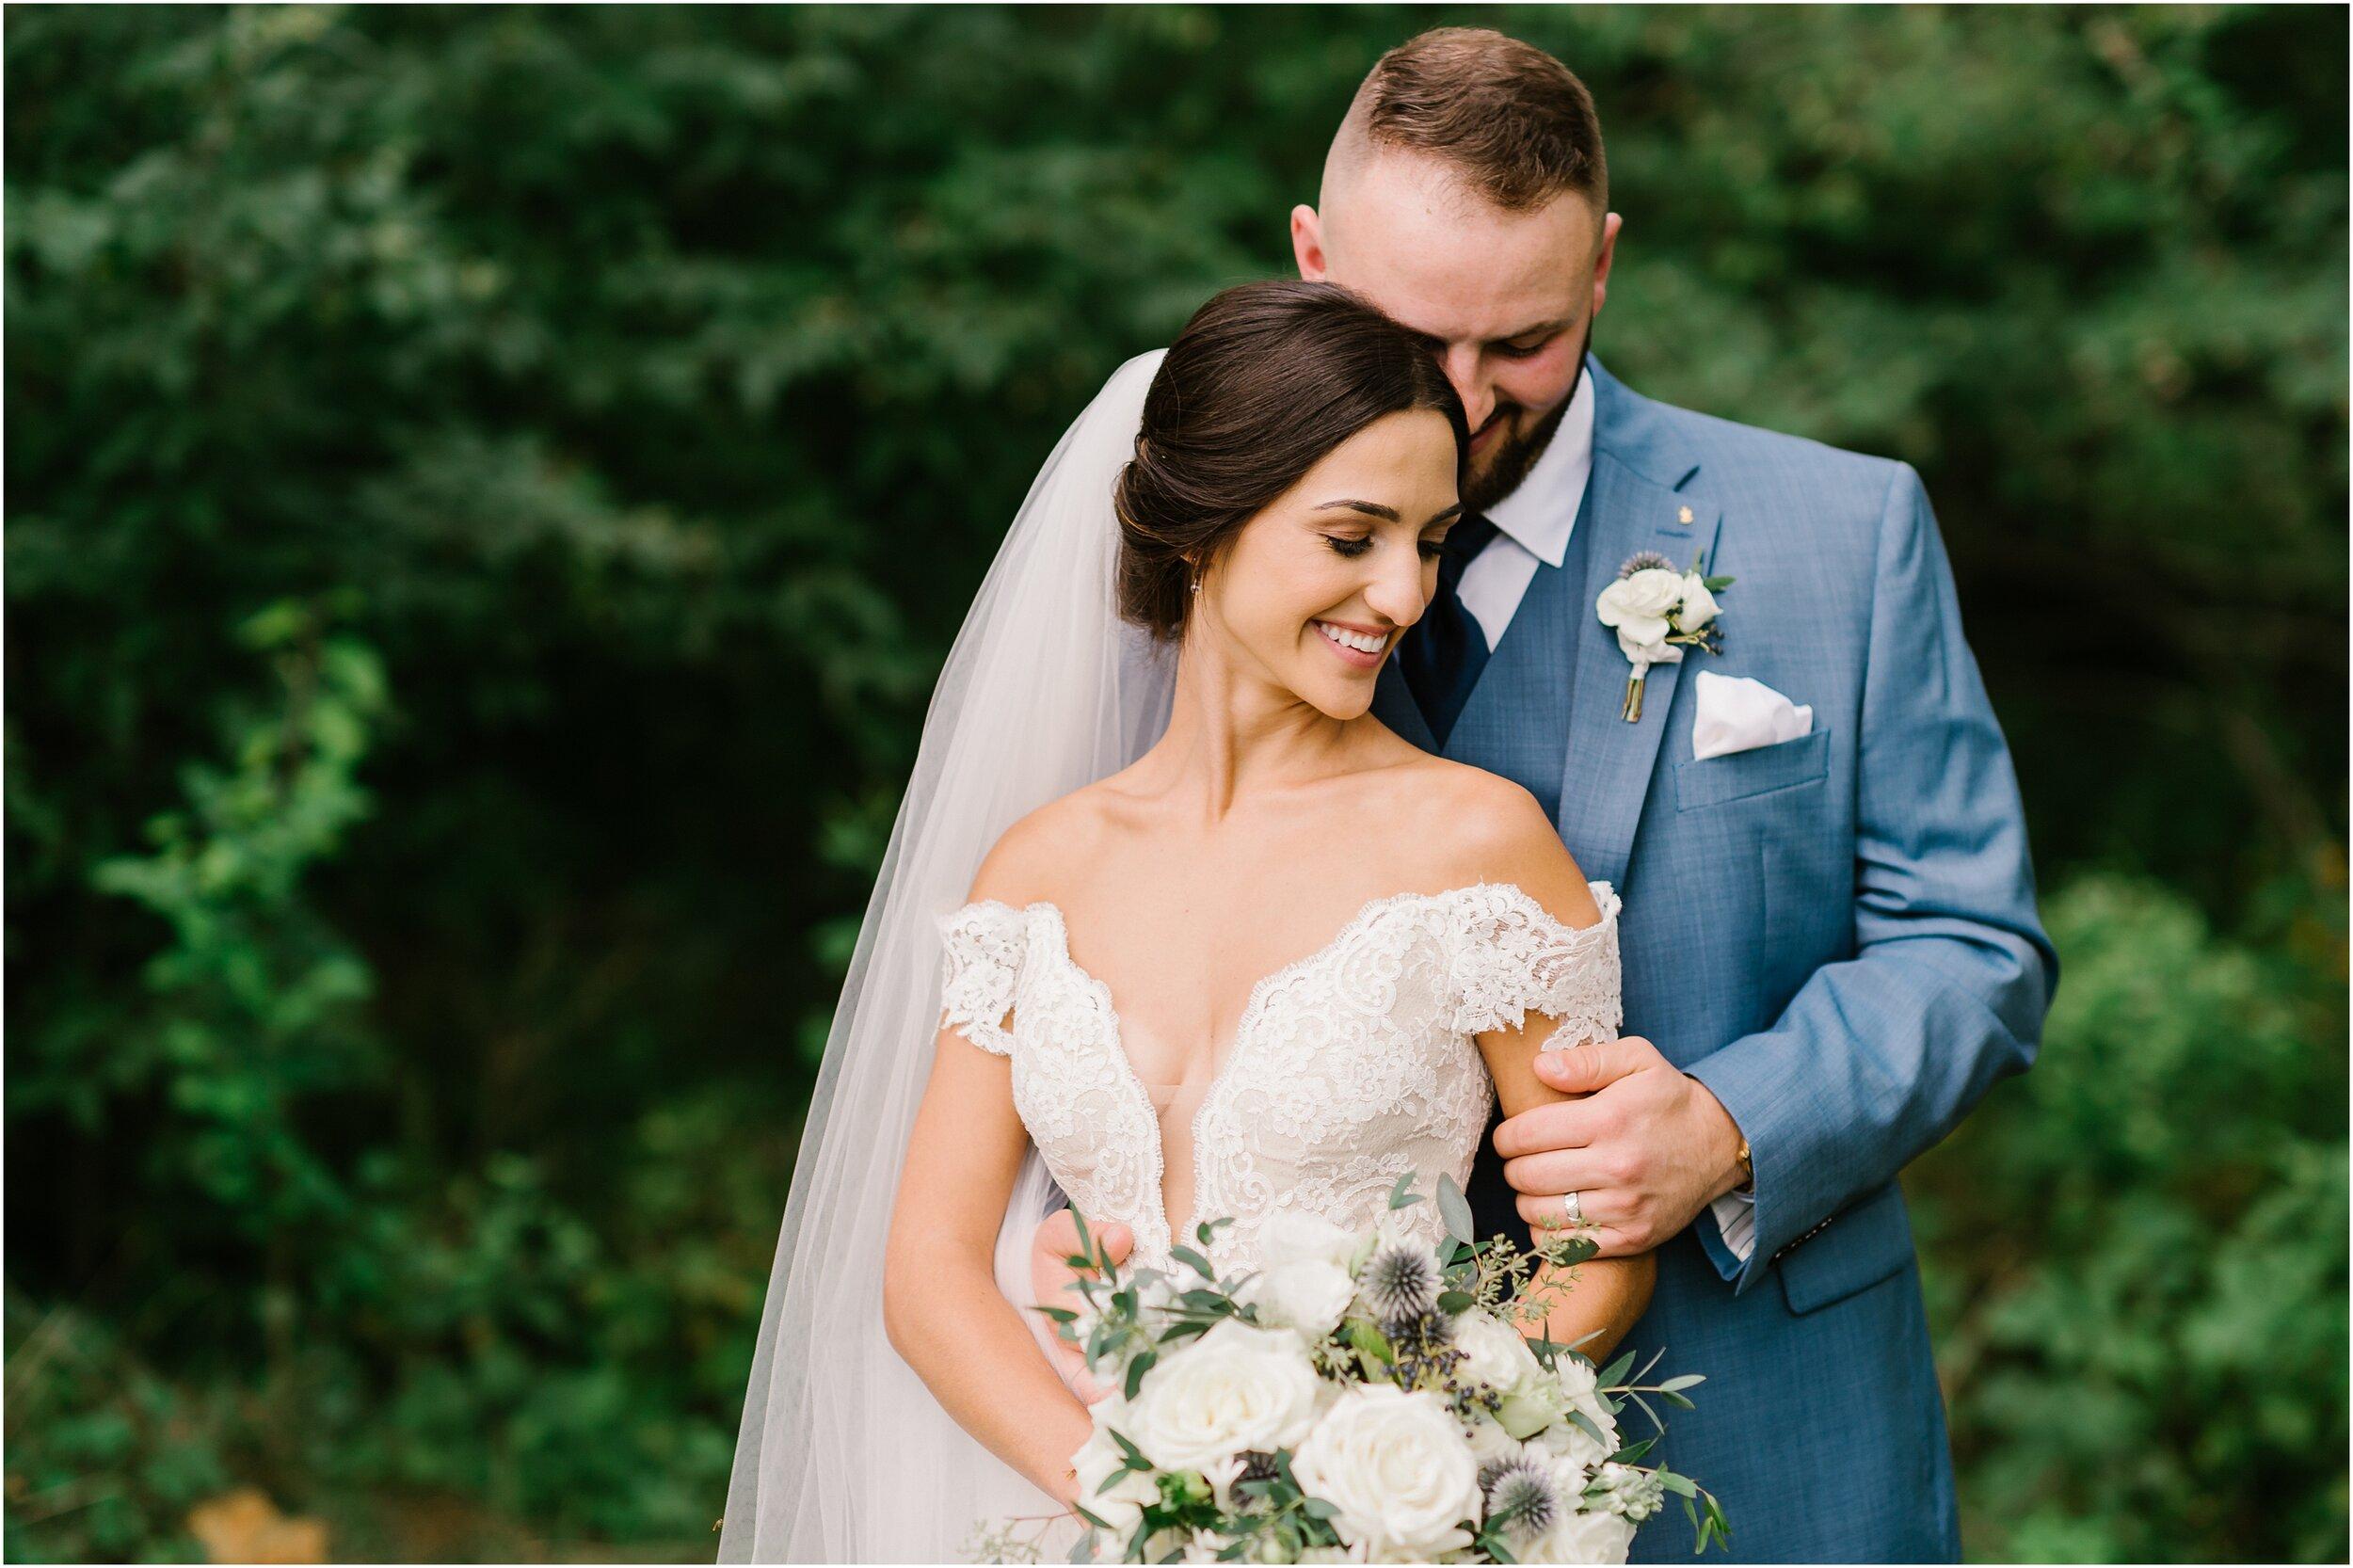 Rebecca Shehorn Photography Indianapolis Wedding Photographer Sycamore at Mallow Run_0758.jpg